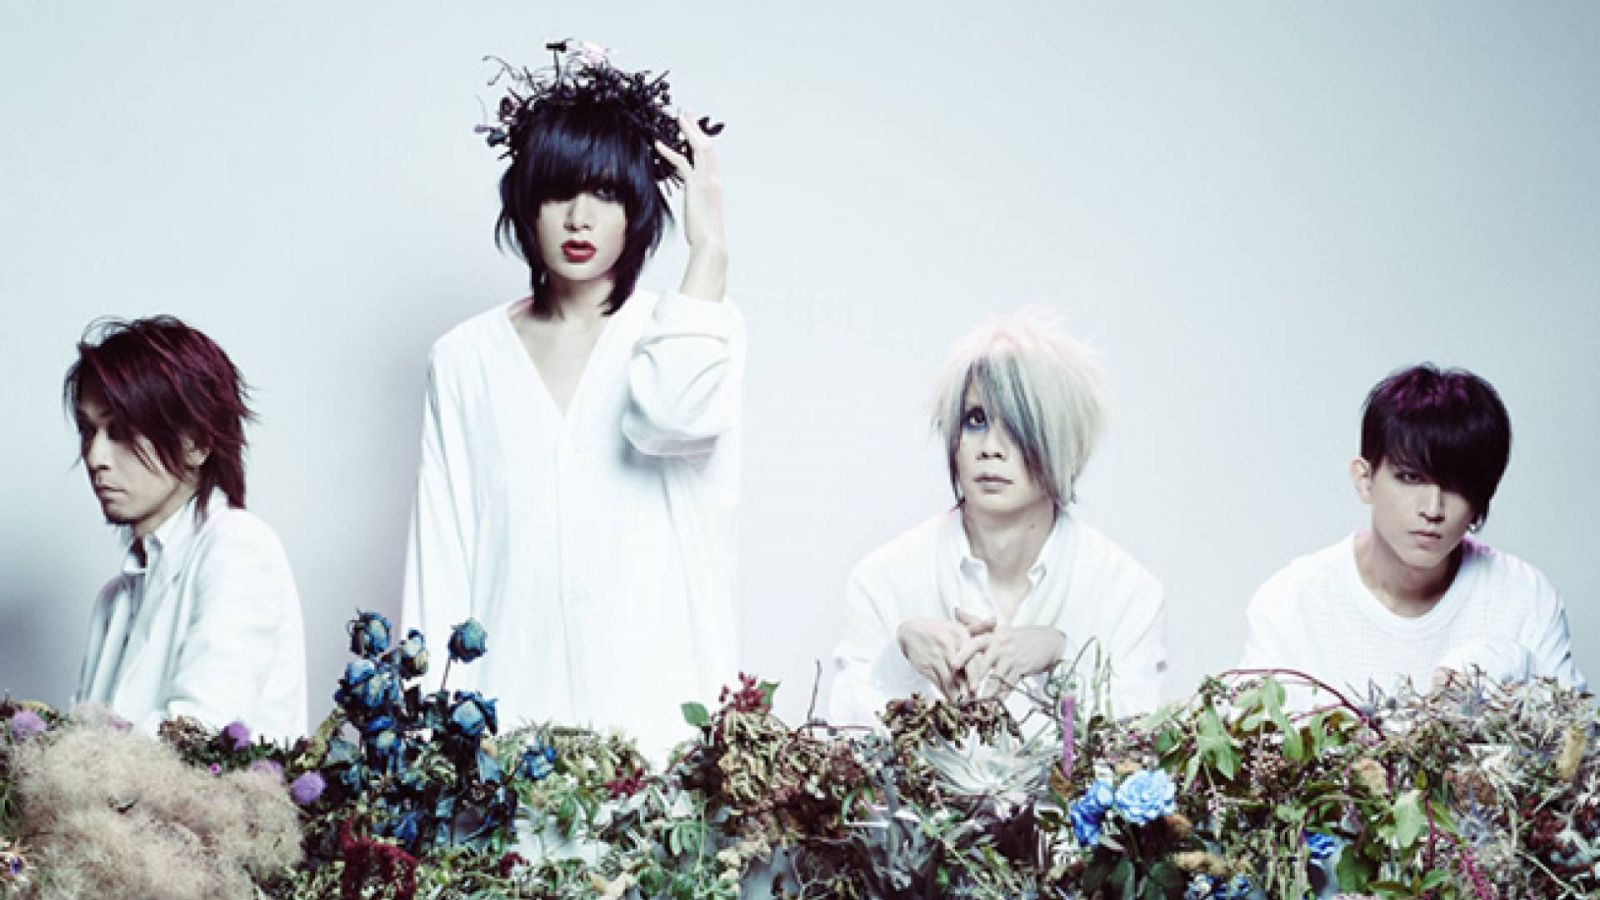 Nouvel album pour Plastic Tree © J-ROCK CO.,LTD. All rights reserved.